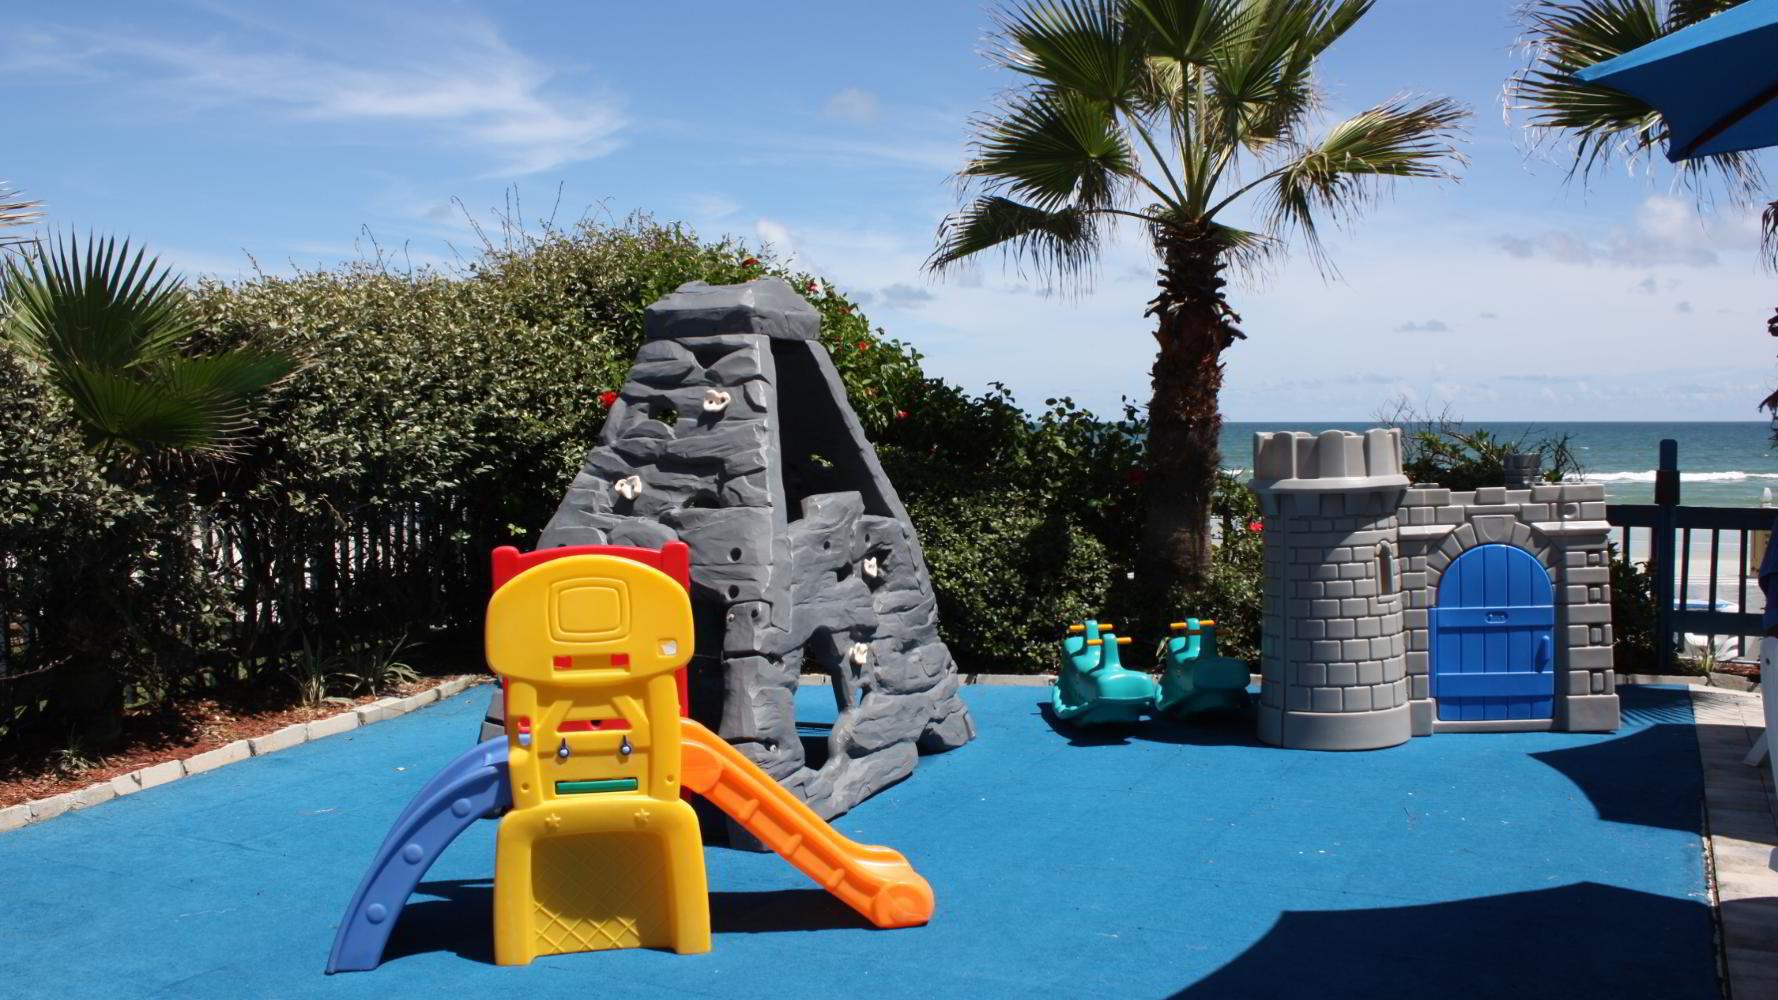 Islander Beach Resort image